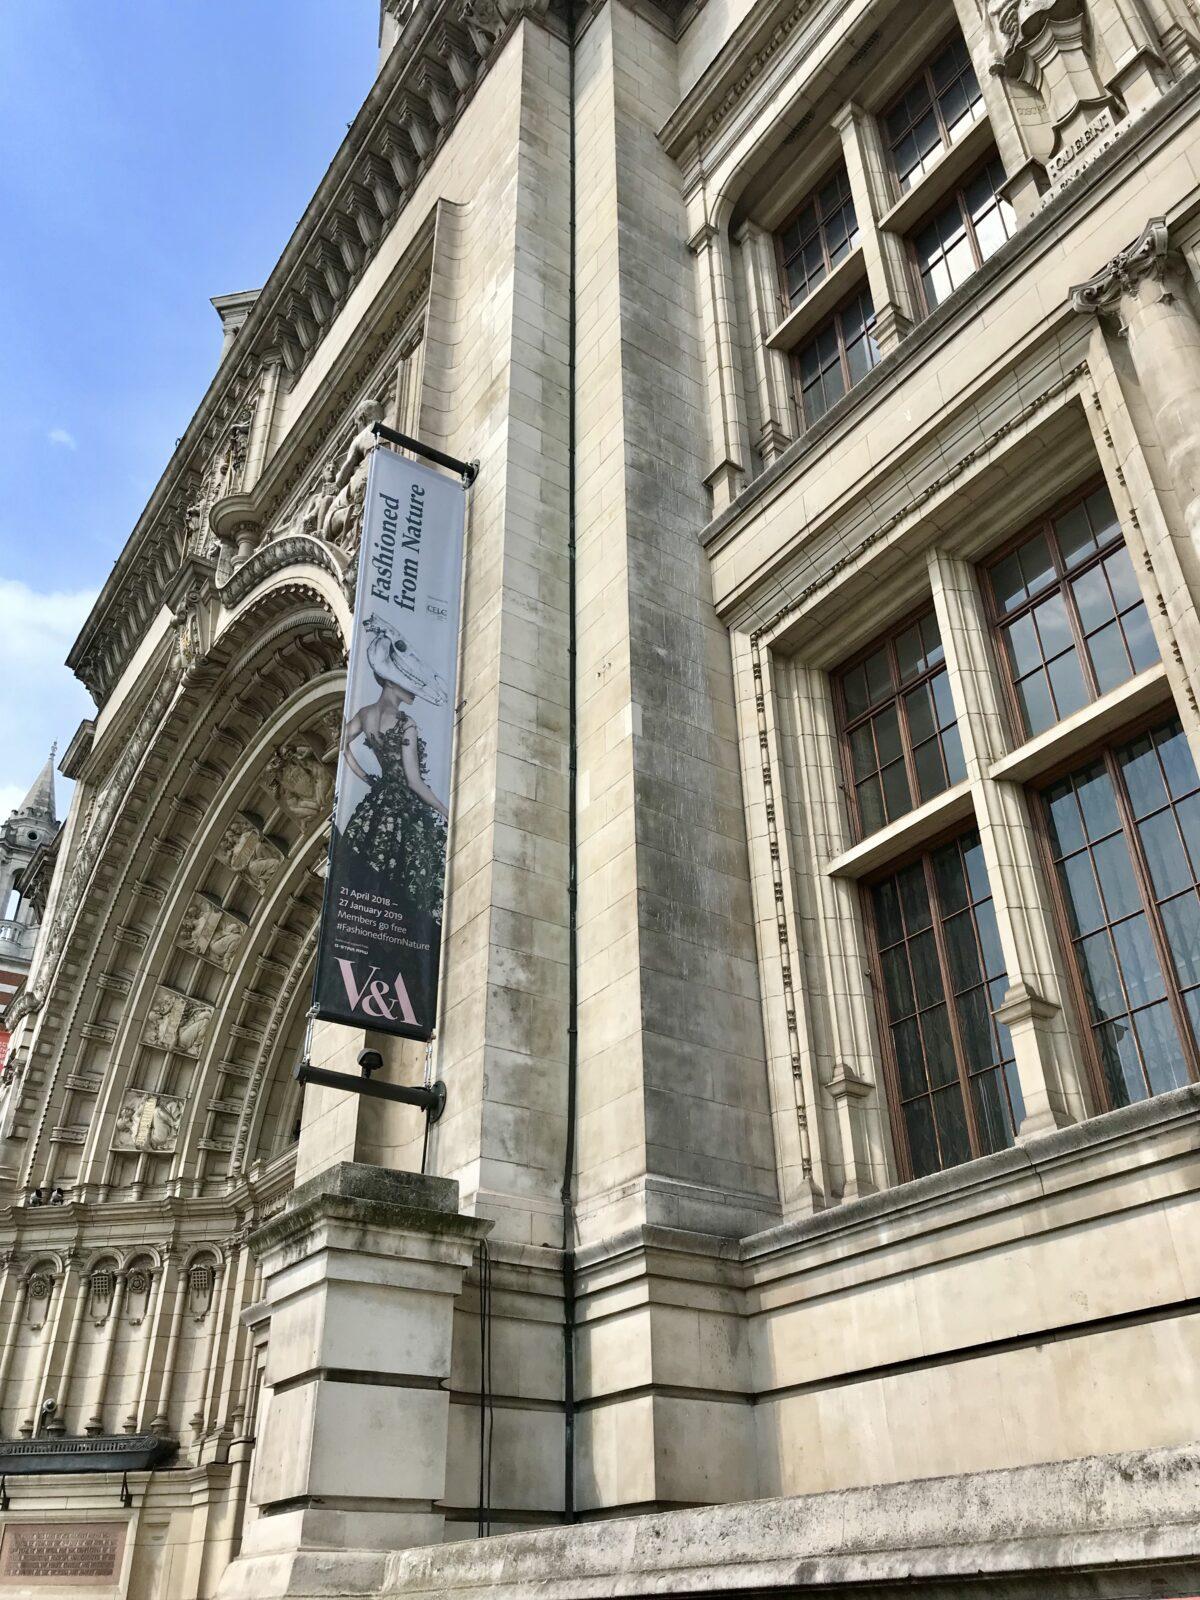 victoria and albert museum london city guide edit seven 2018